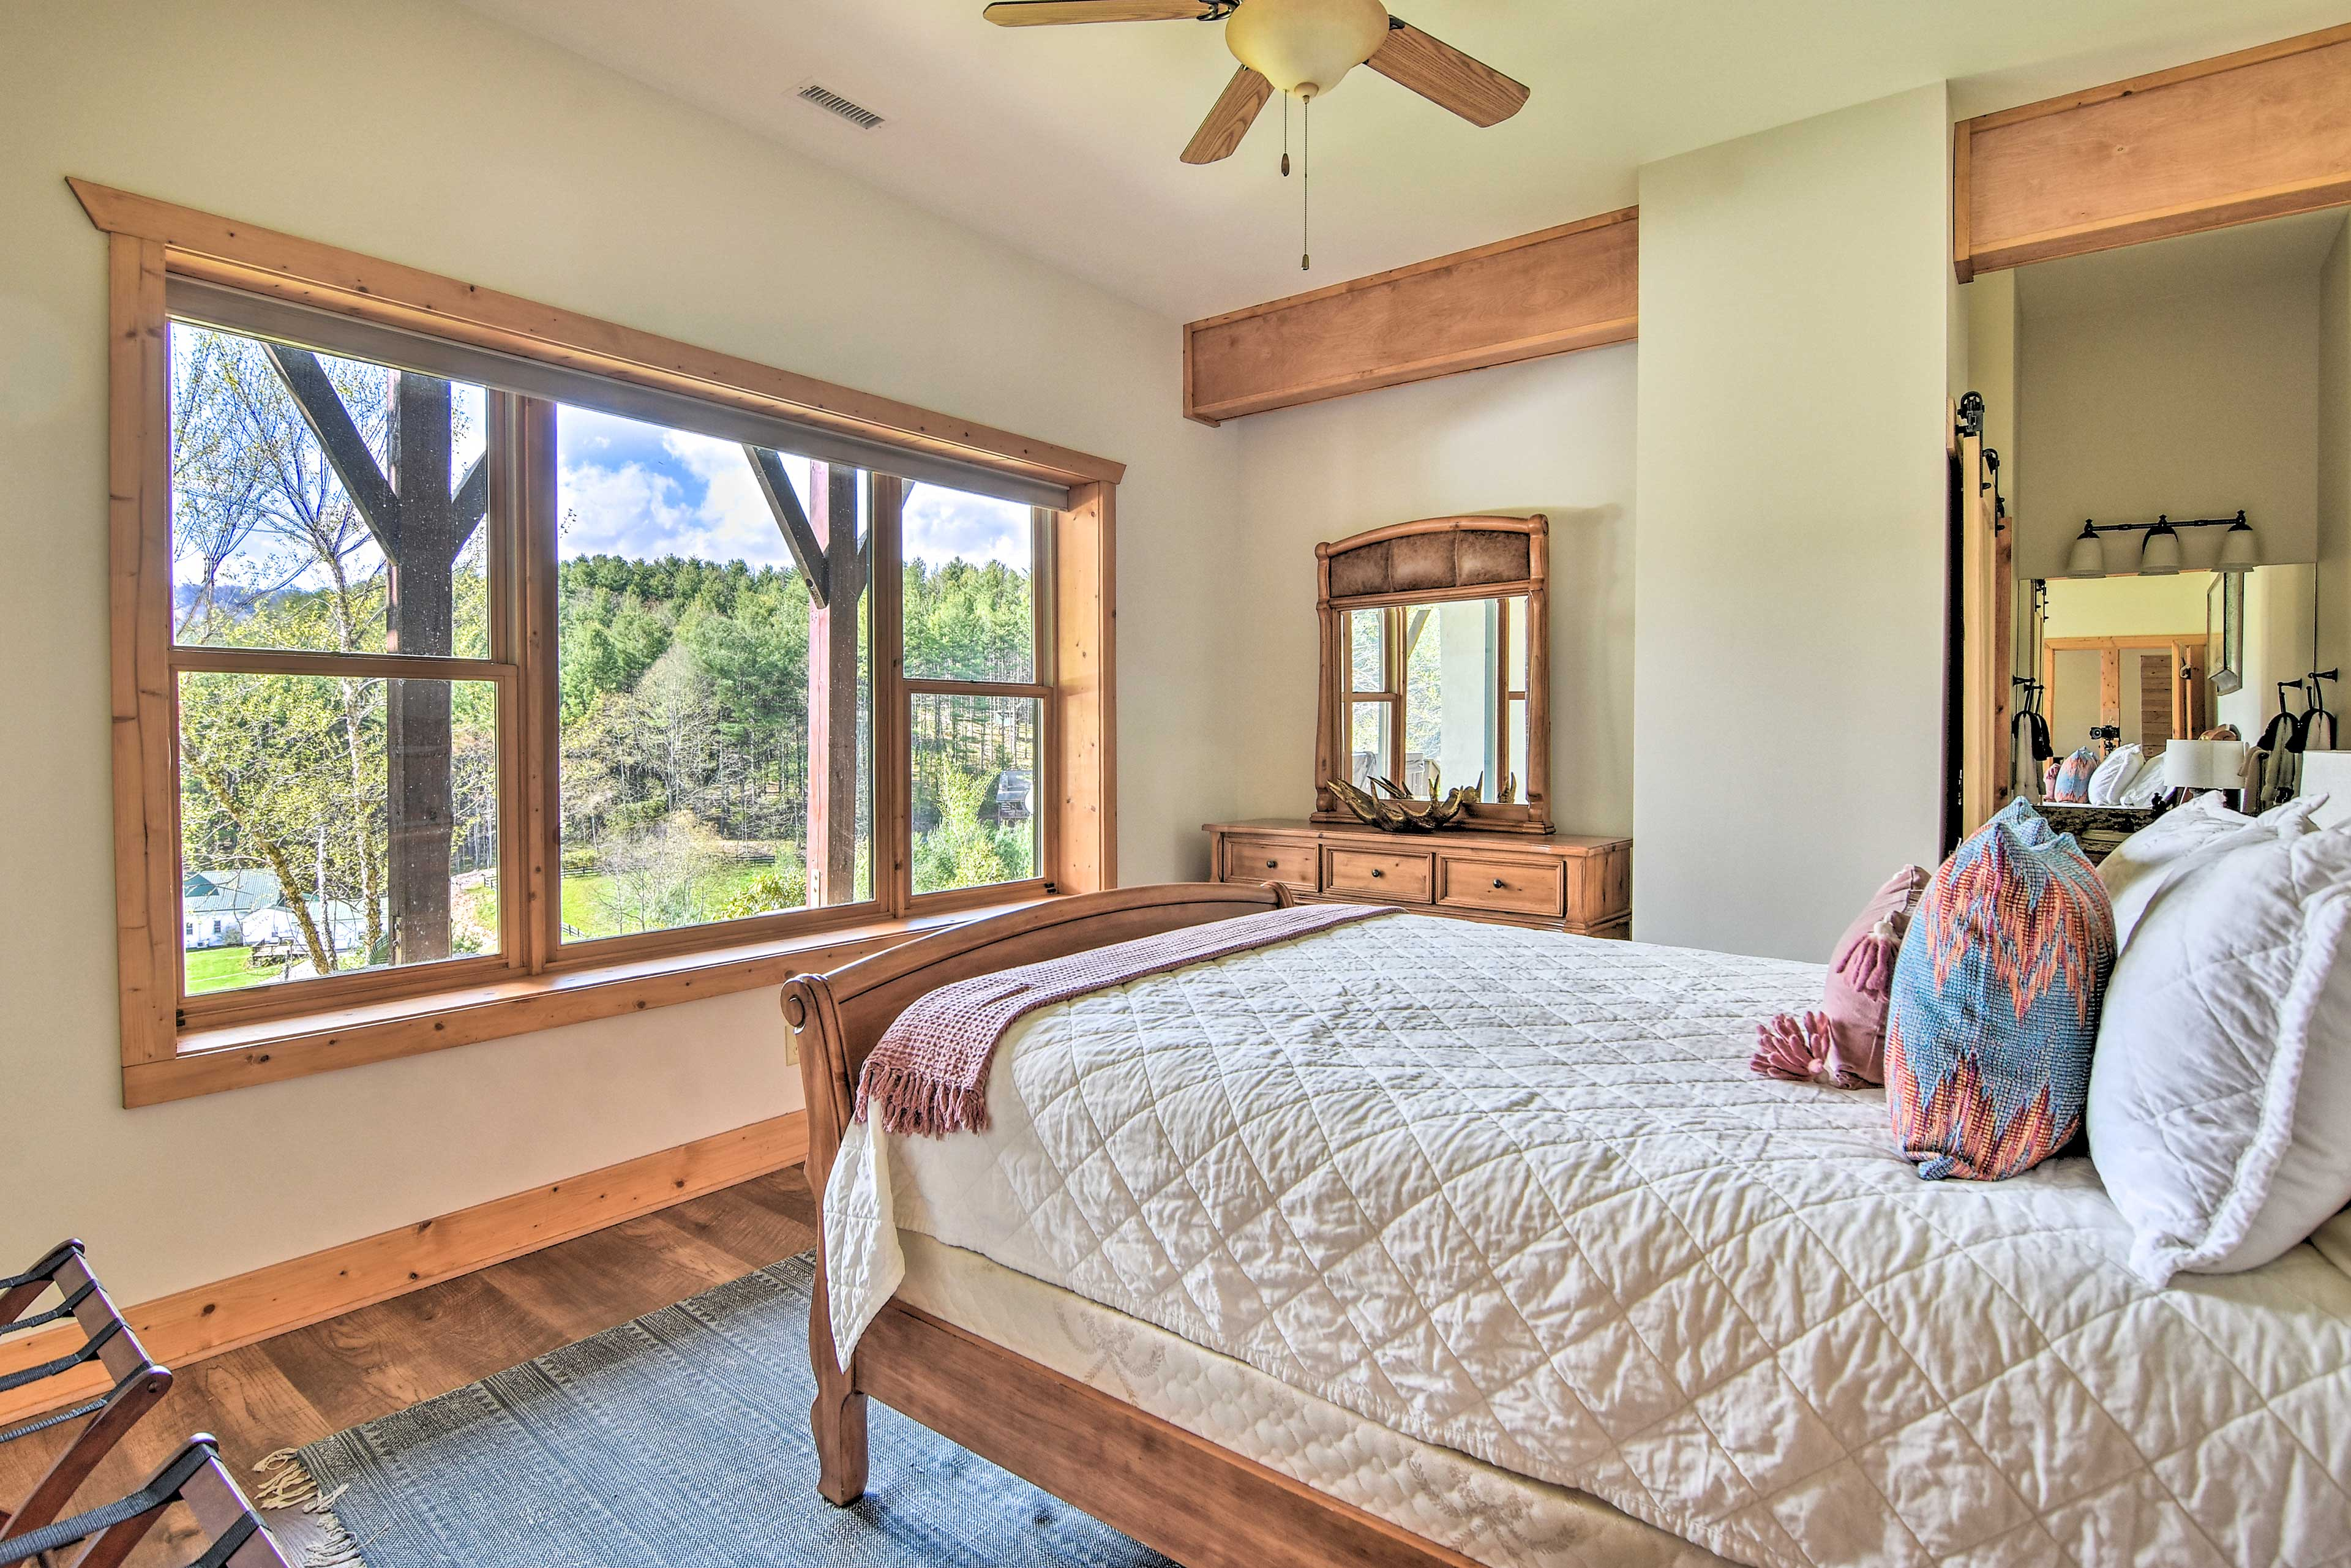 Wake up to wonderful views of the Blue Ridge Mountains!